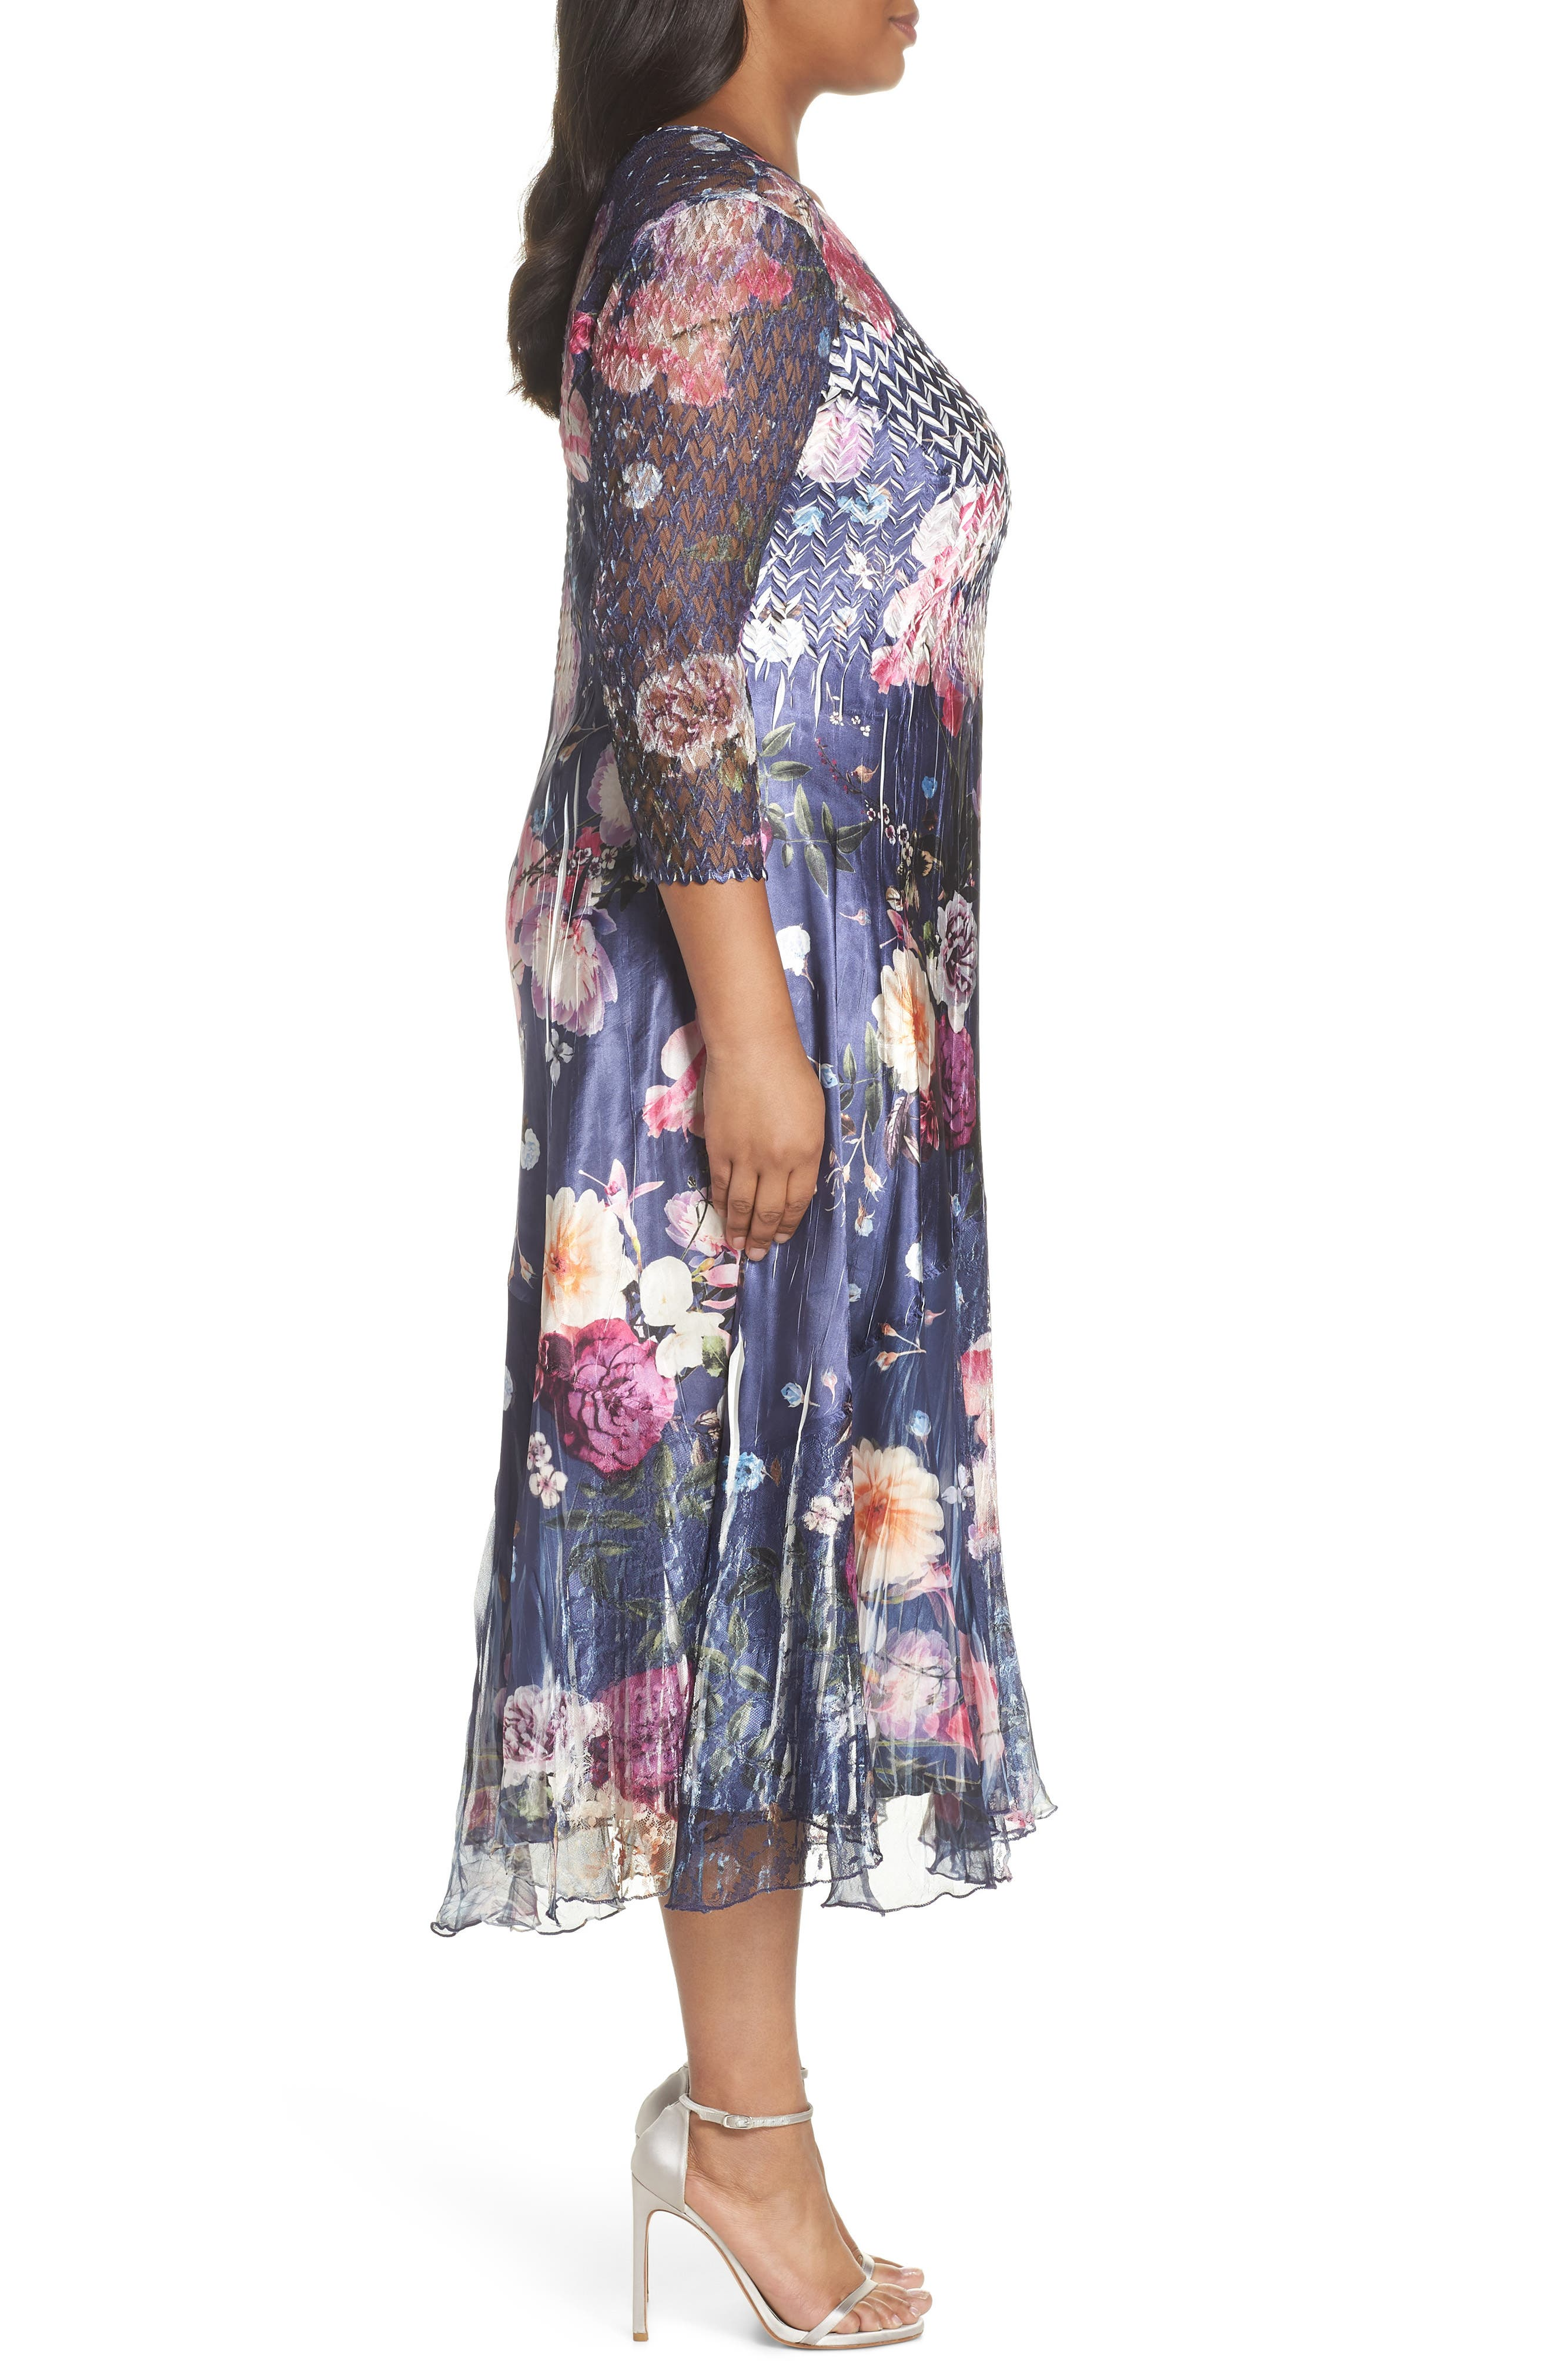 Koramov Floral Print Lace Inset Dress,                             Alternate thumbnail 3, color,                             500